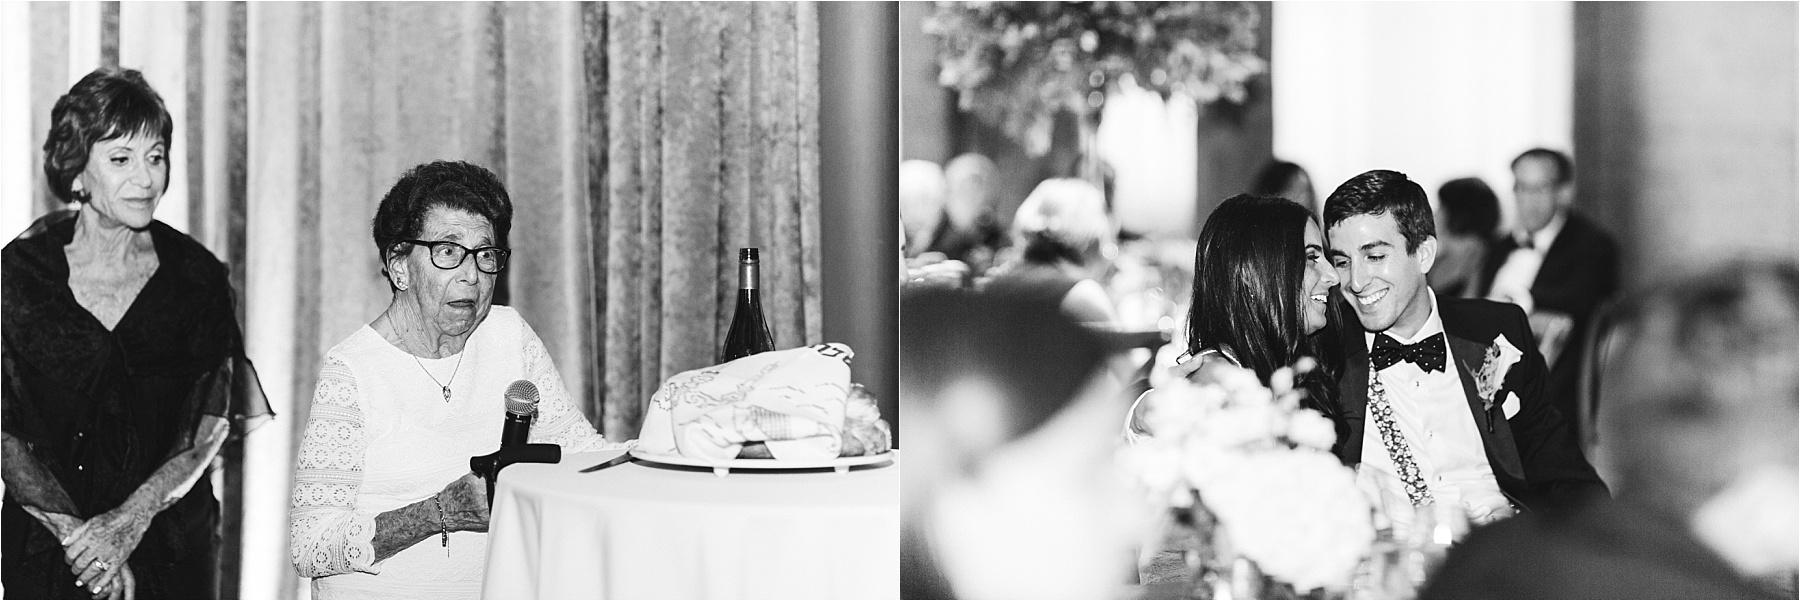 Bridgeport Art Center Wedding_0134.jpg